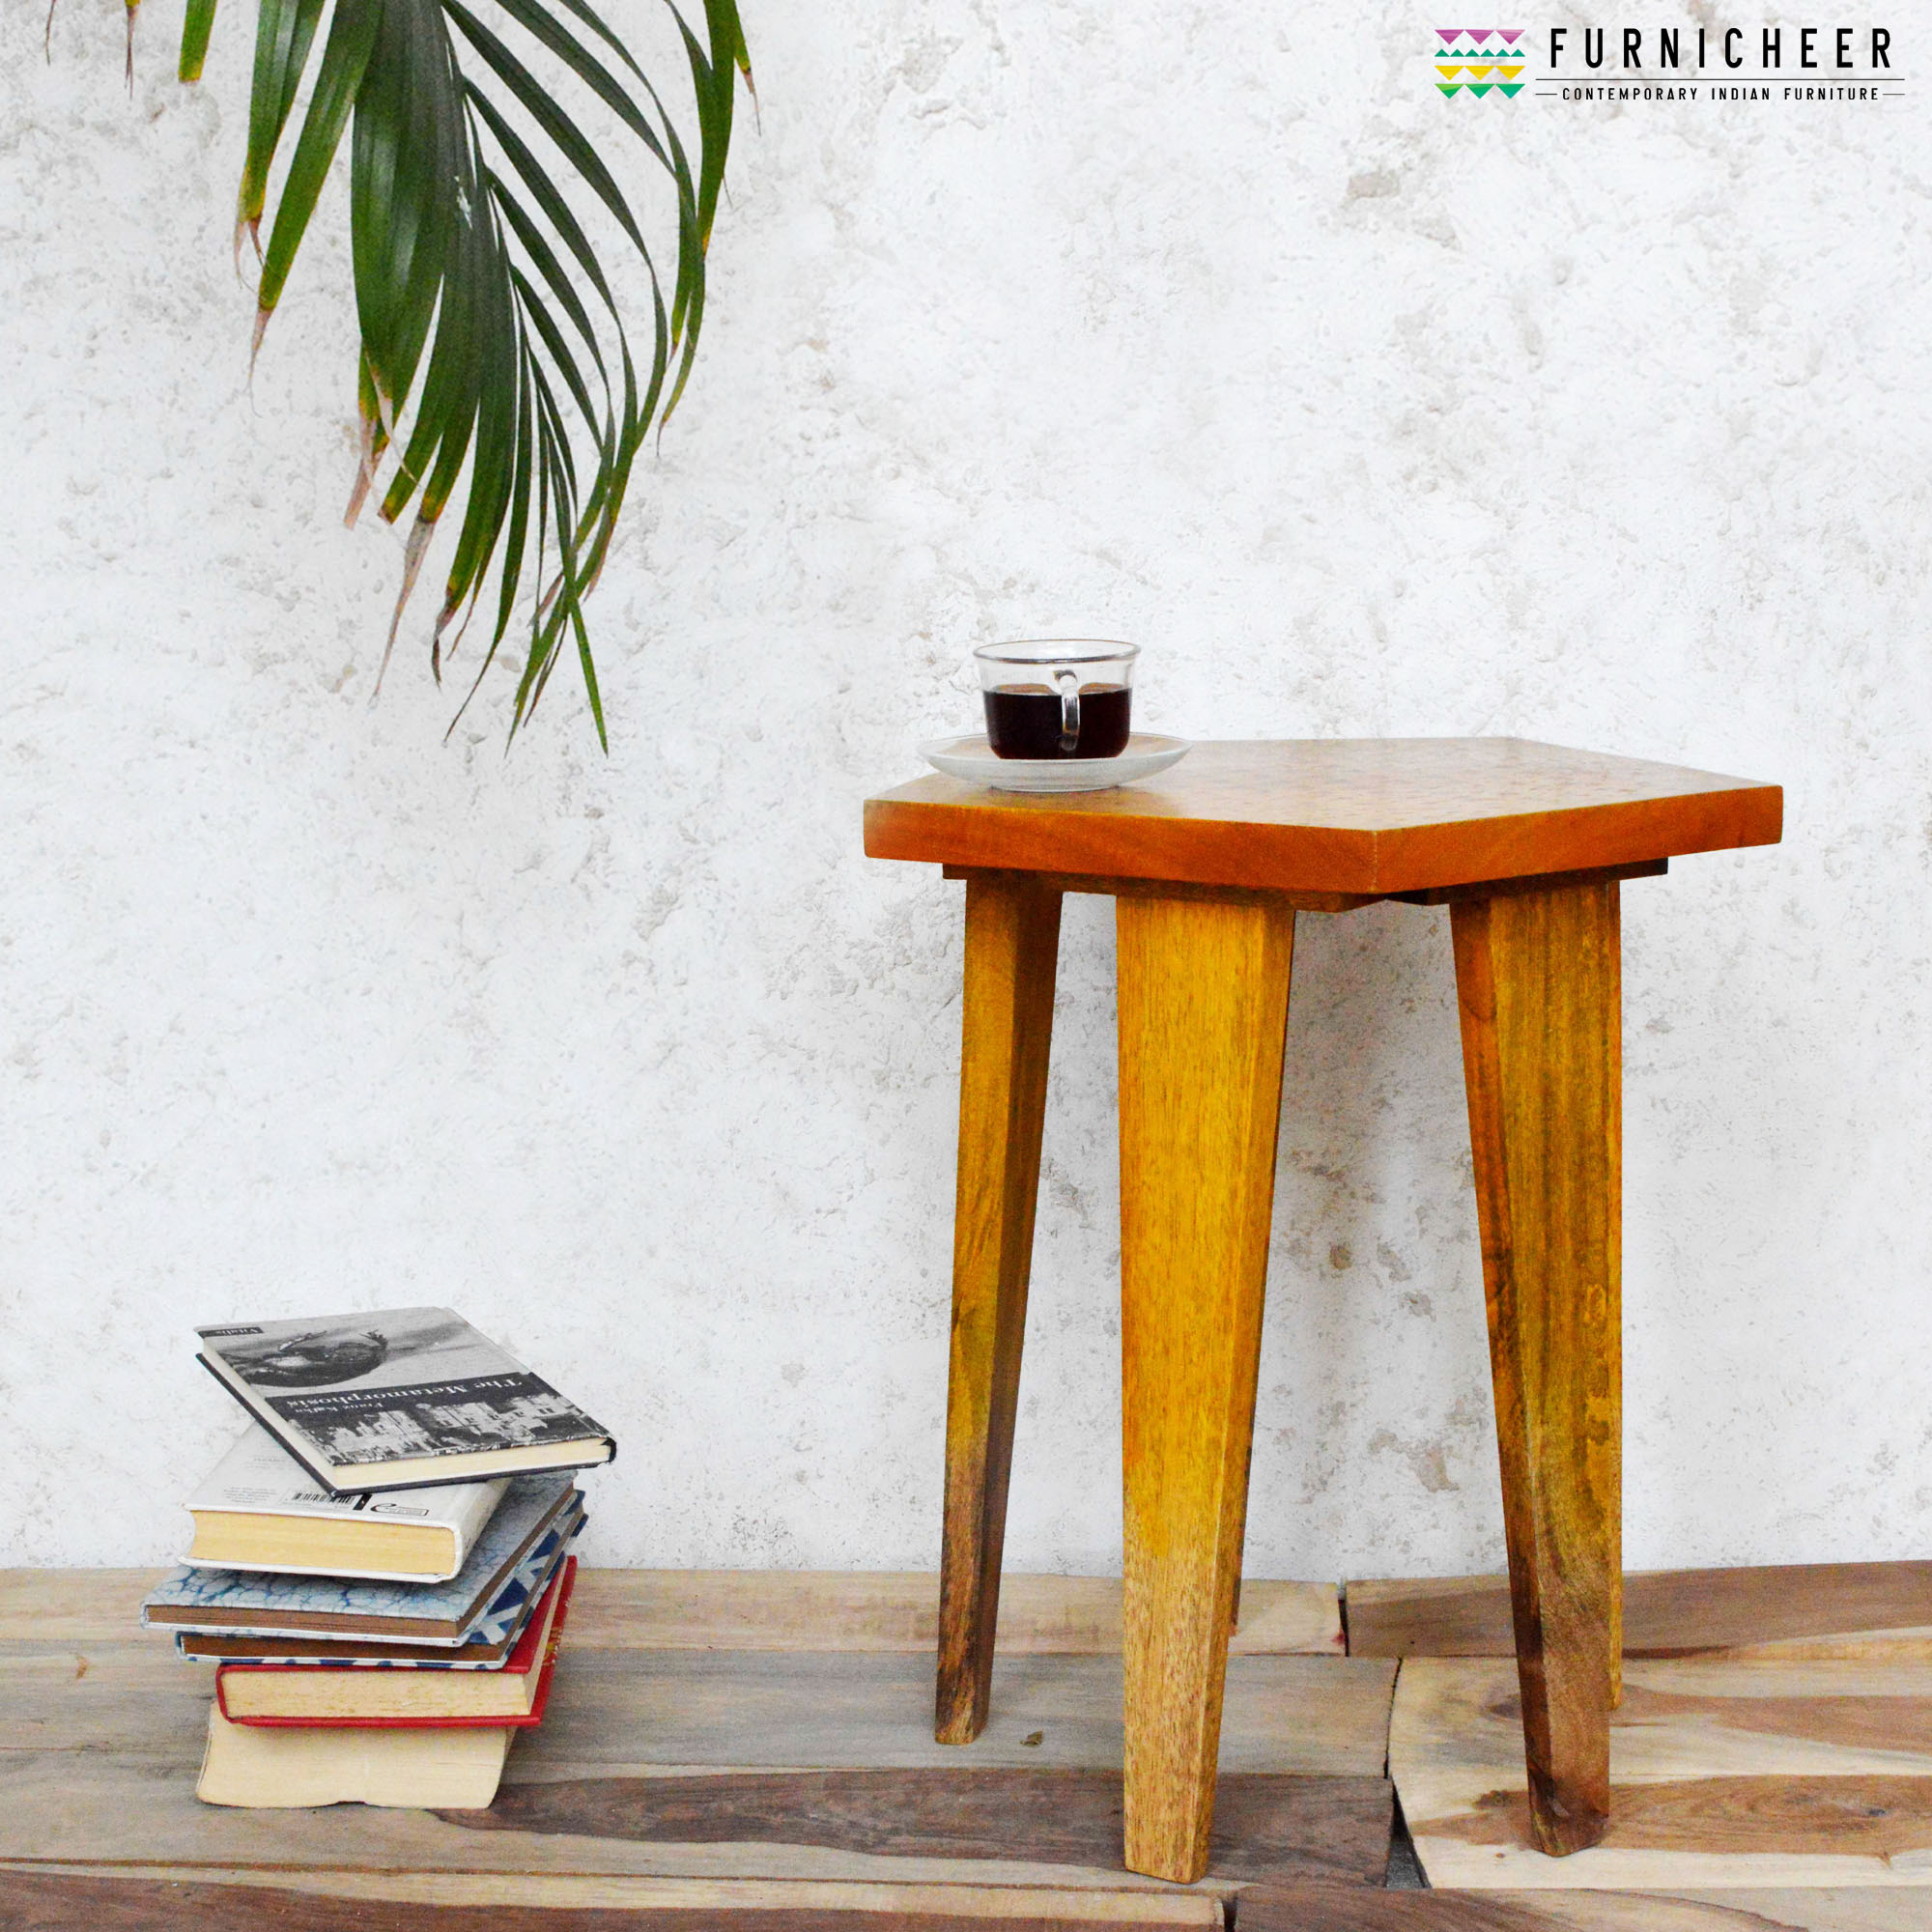 1.SIDE & END TABLE SKU TYSR0001